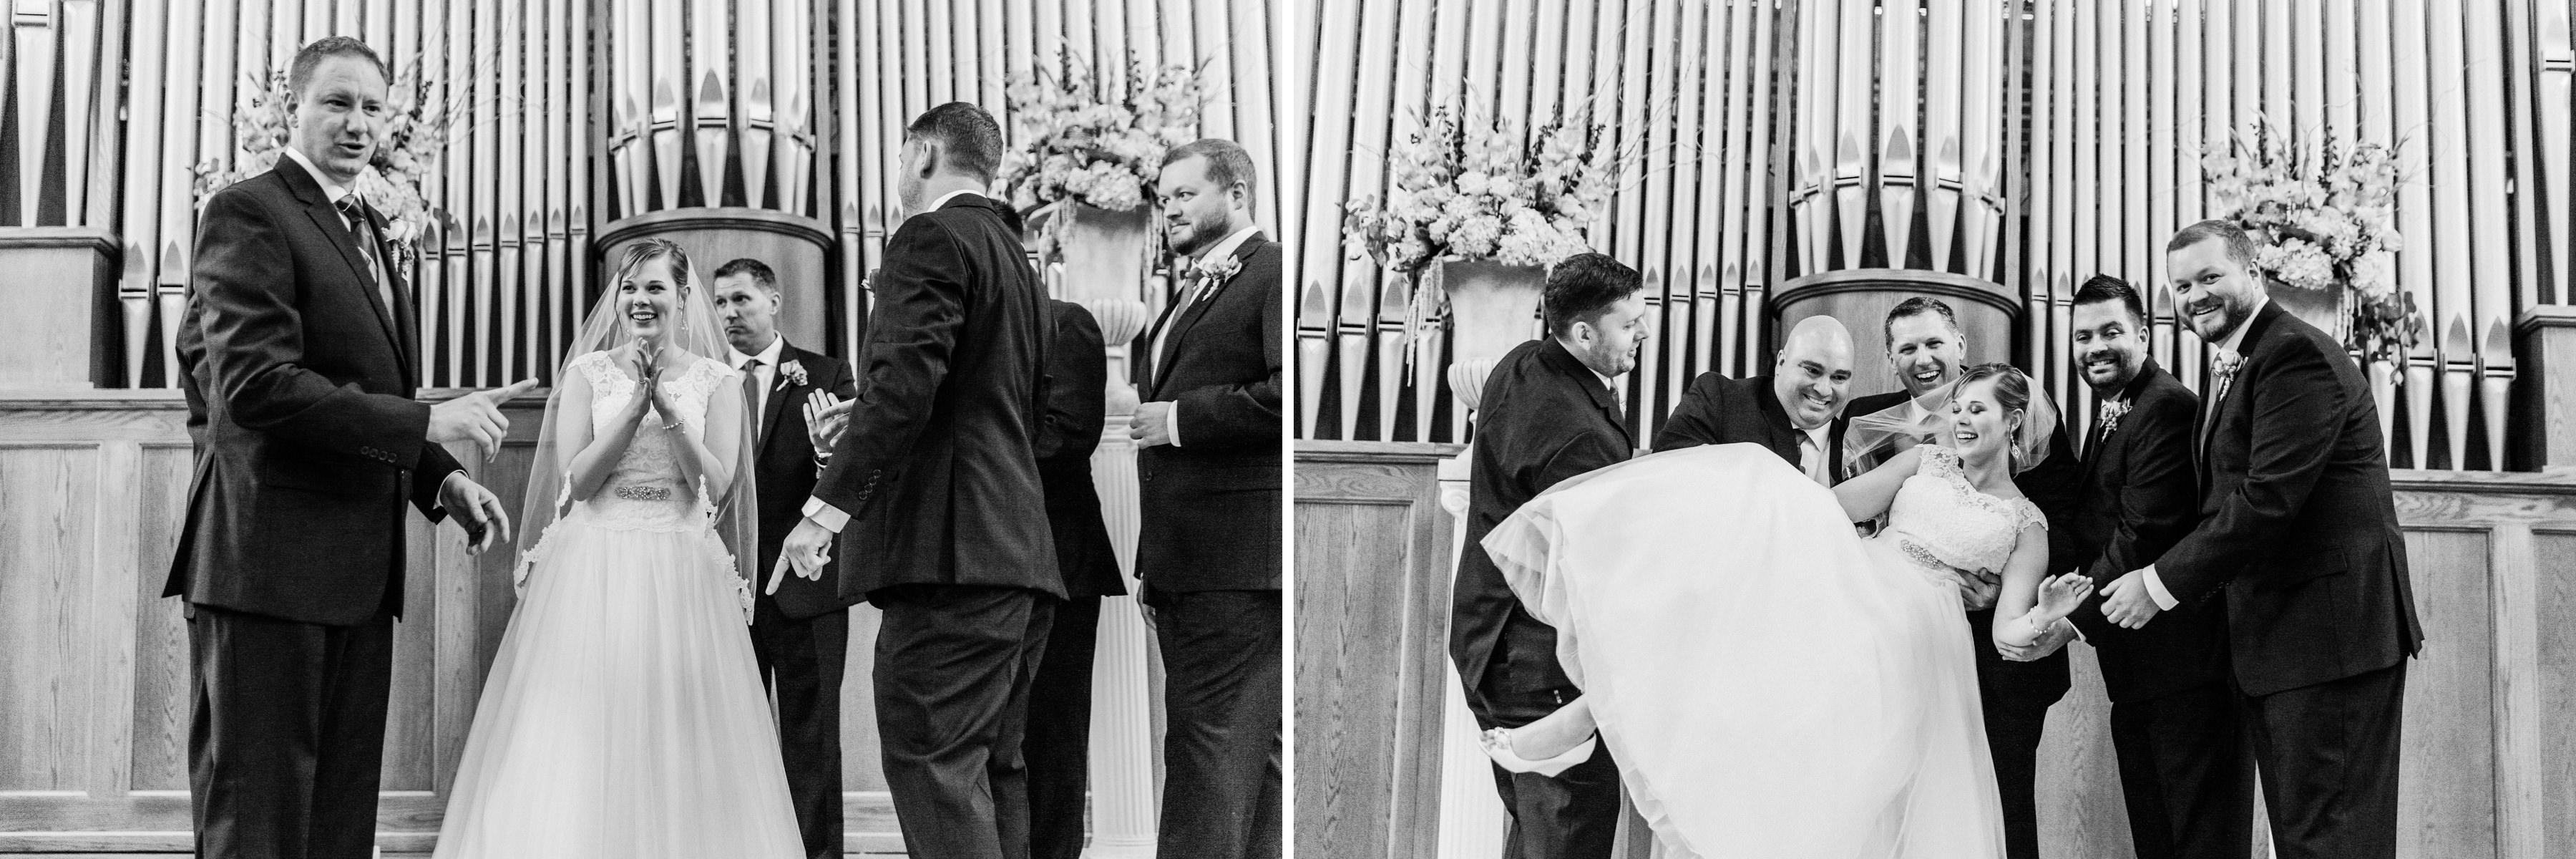 MAULDIN_WEDDING_MONTGOMERY_ALABAMA_WEDDING_PHOTOGRAPHY_70